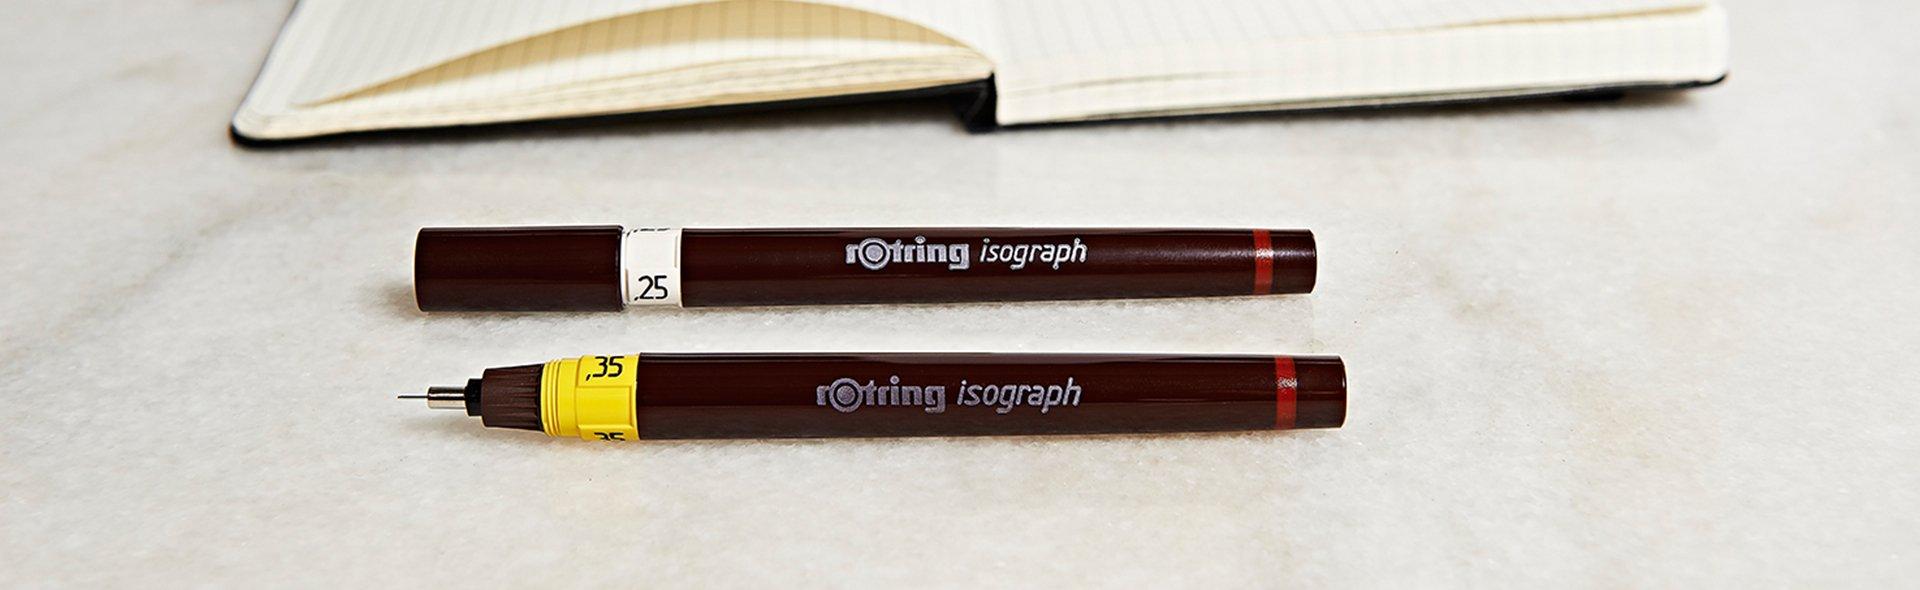 ... pen high precision technical pen with refillable ink reservoir